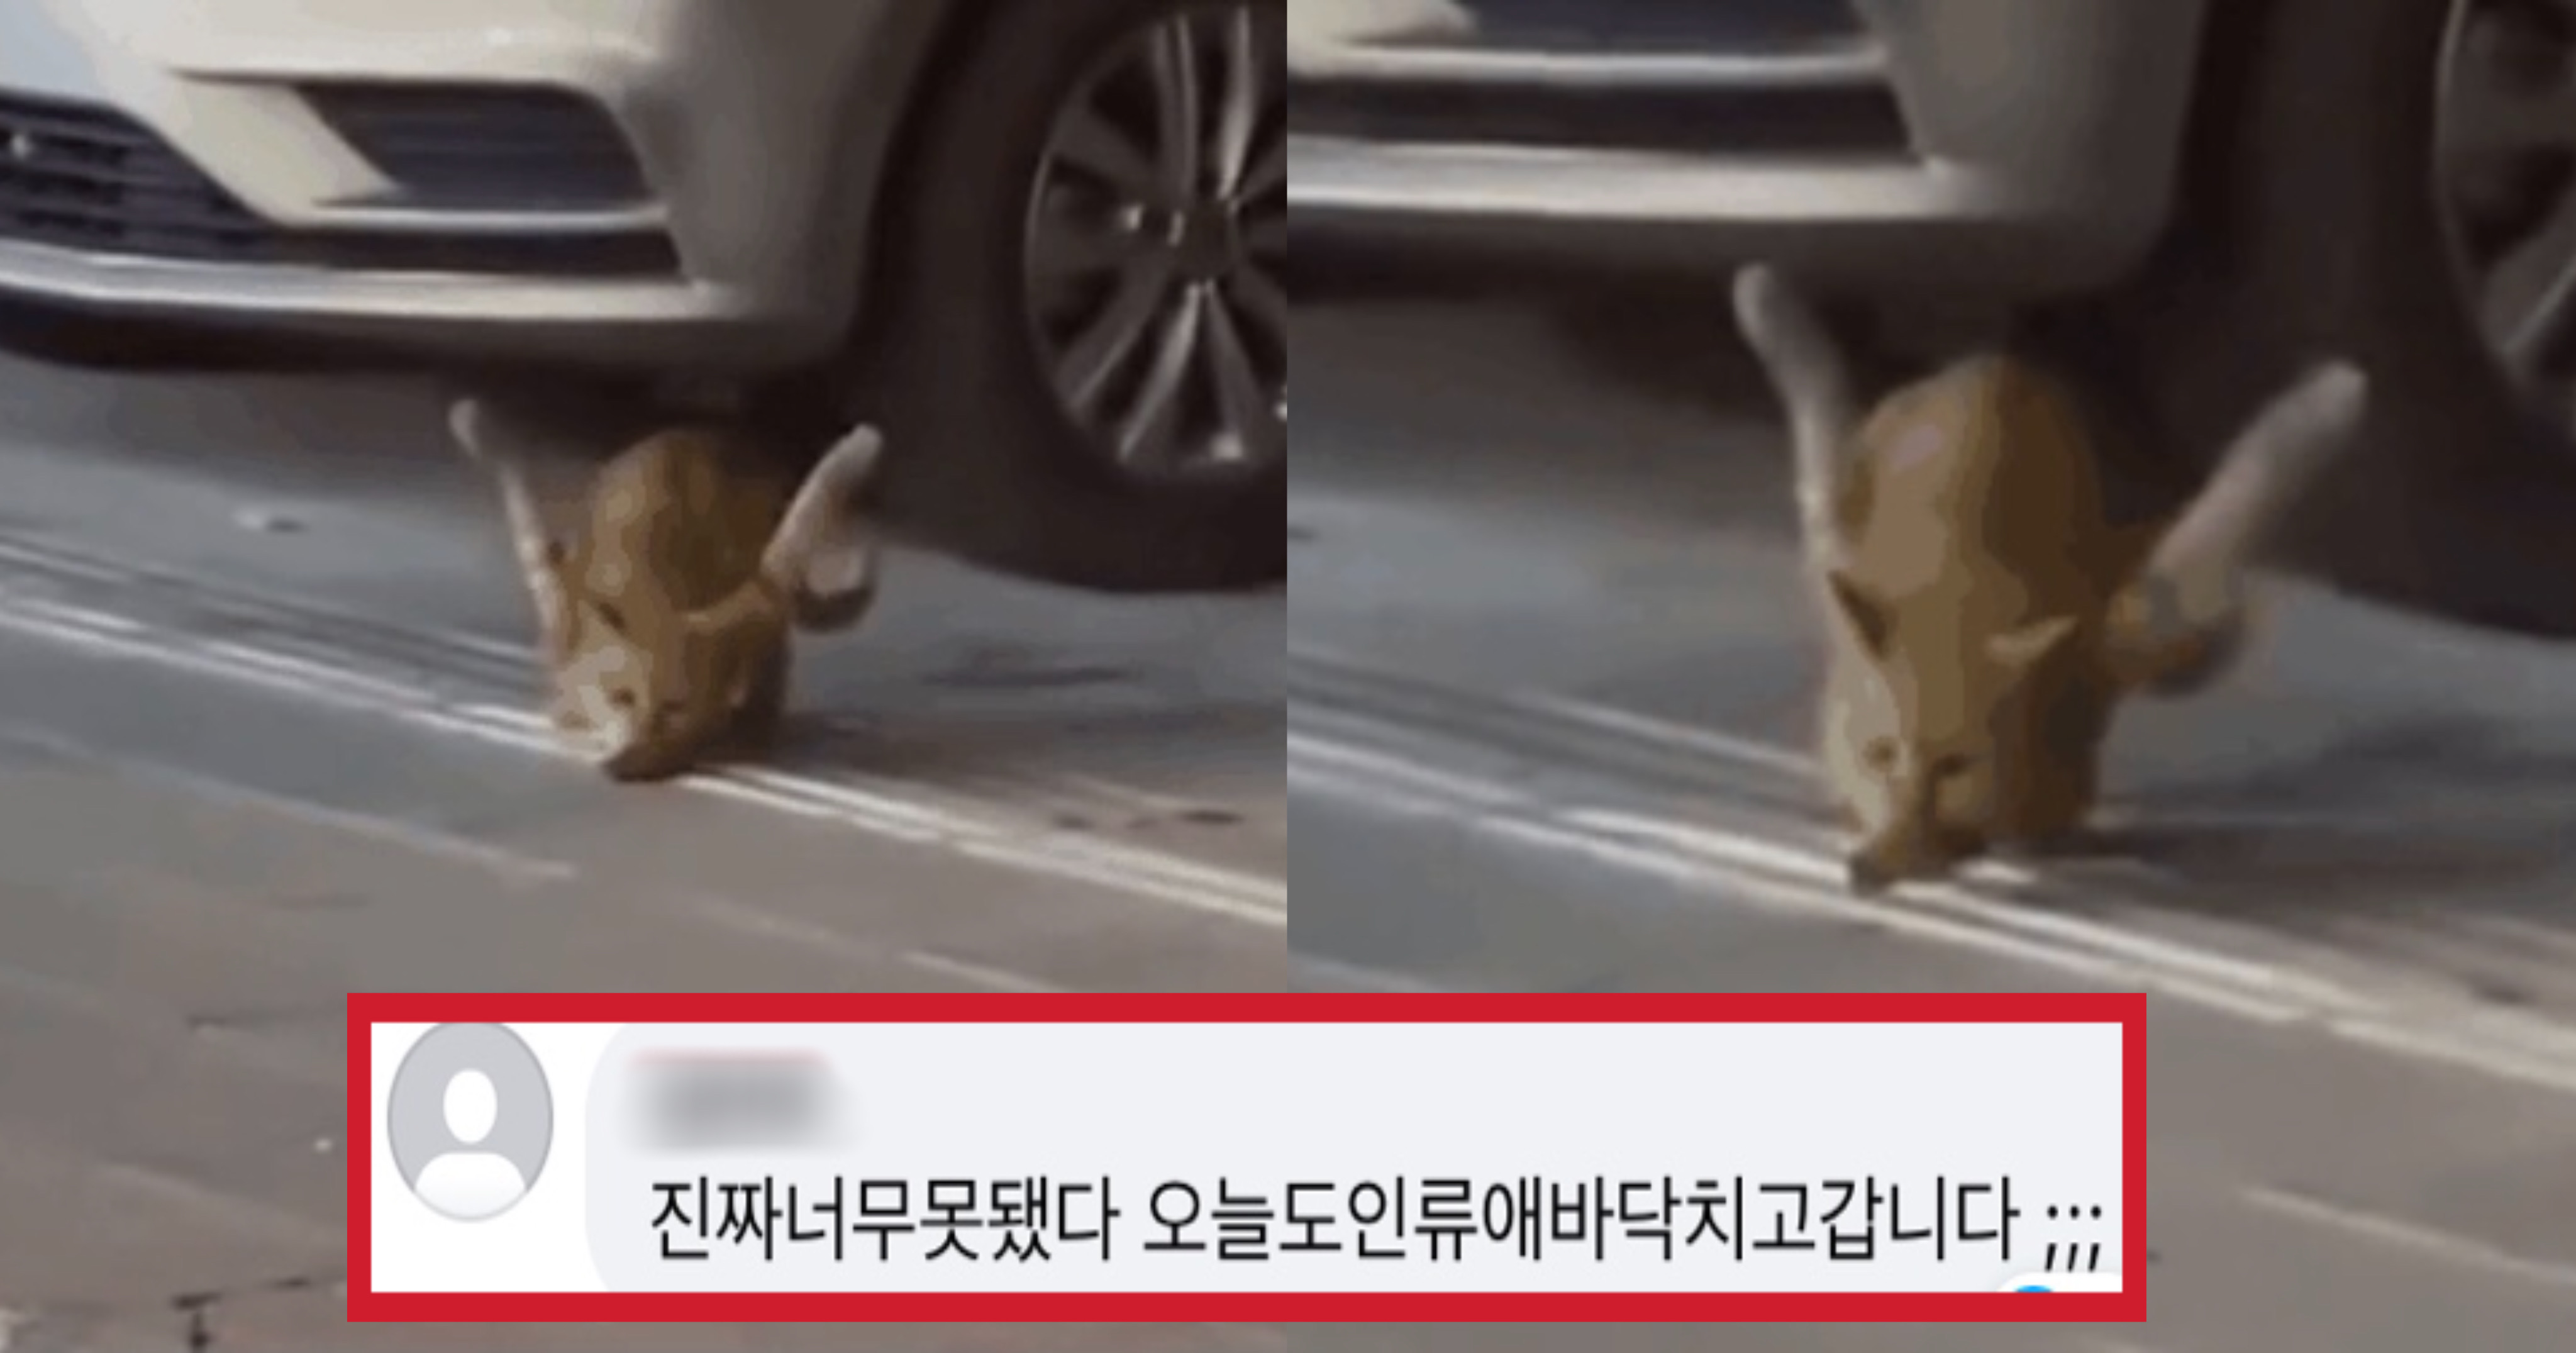 "3fff2bc1 0538 4704 9f50 d5c2349bc89e.jpeg - ""길 가는데 앞다리 두 개가 모두 바깥으로 꺾여 있는 고양이를 발견했어요"""